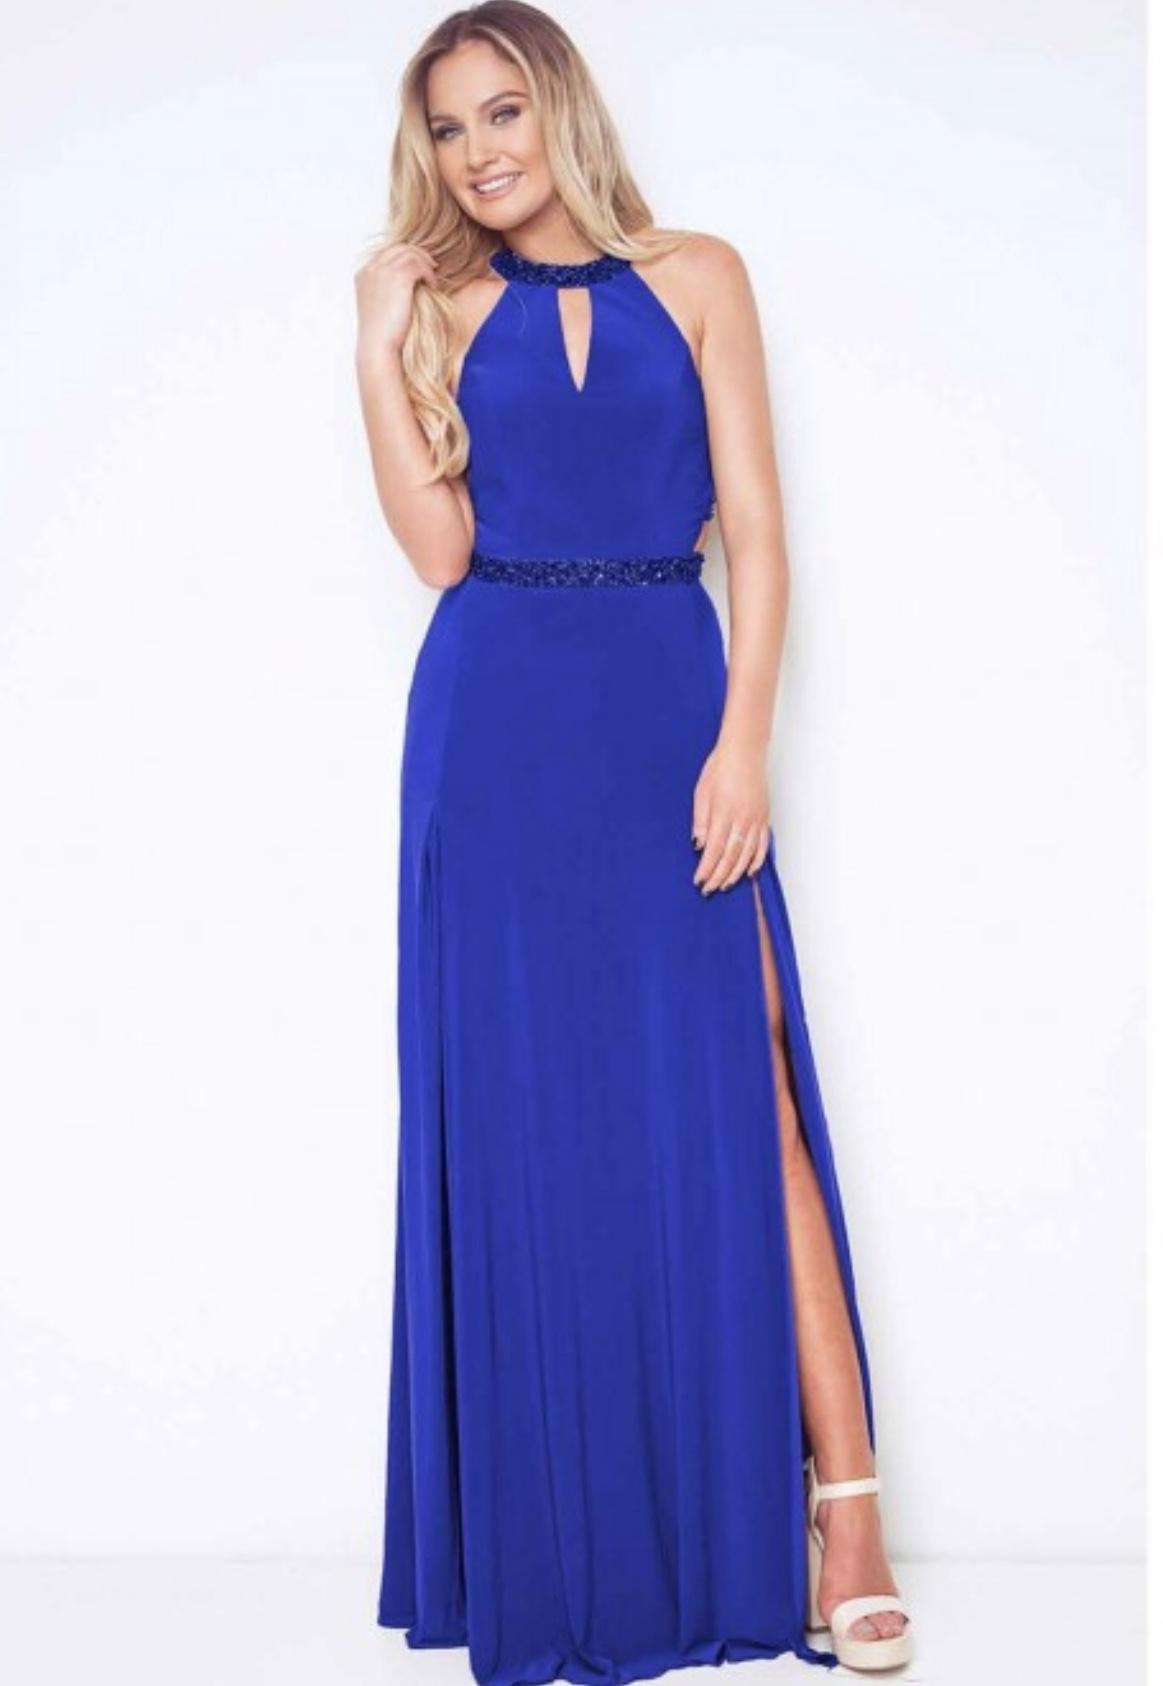 Dynasty London 1013015 royal blue (Copy) - Ladida Boutique 8aafb7bb6